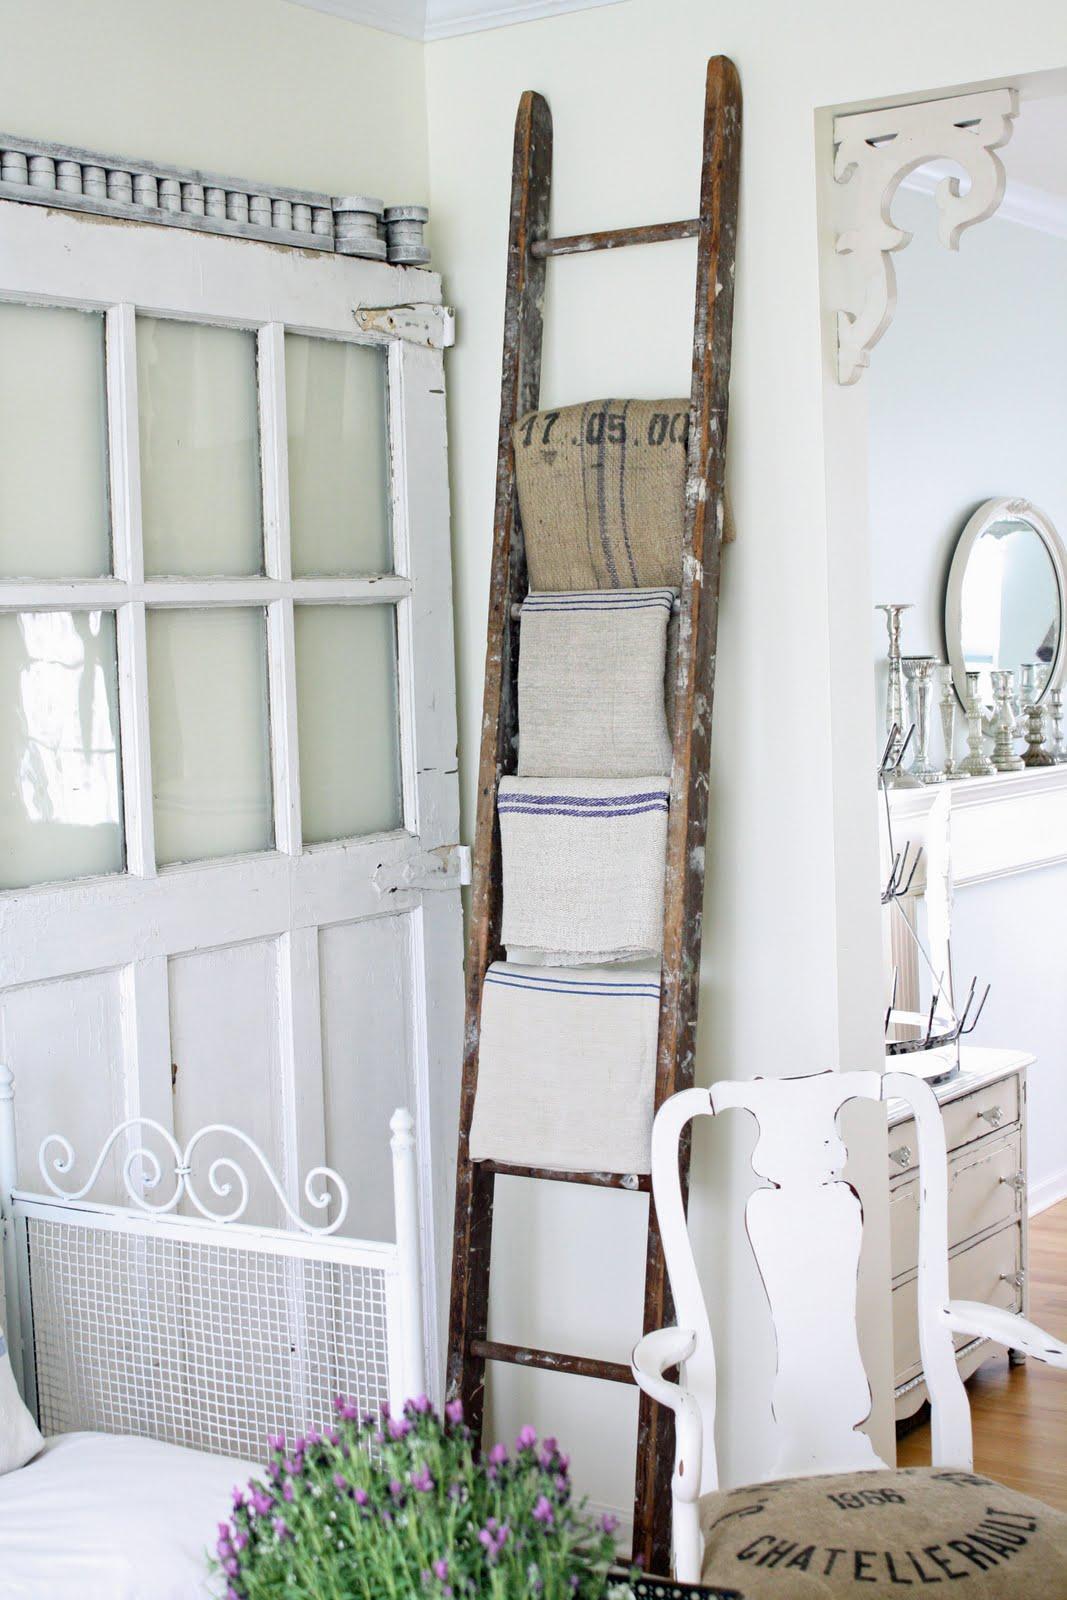 Fauna Decorativa Escalera Como Toallero Ladder As Towel